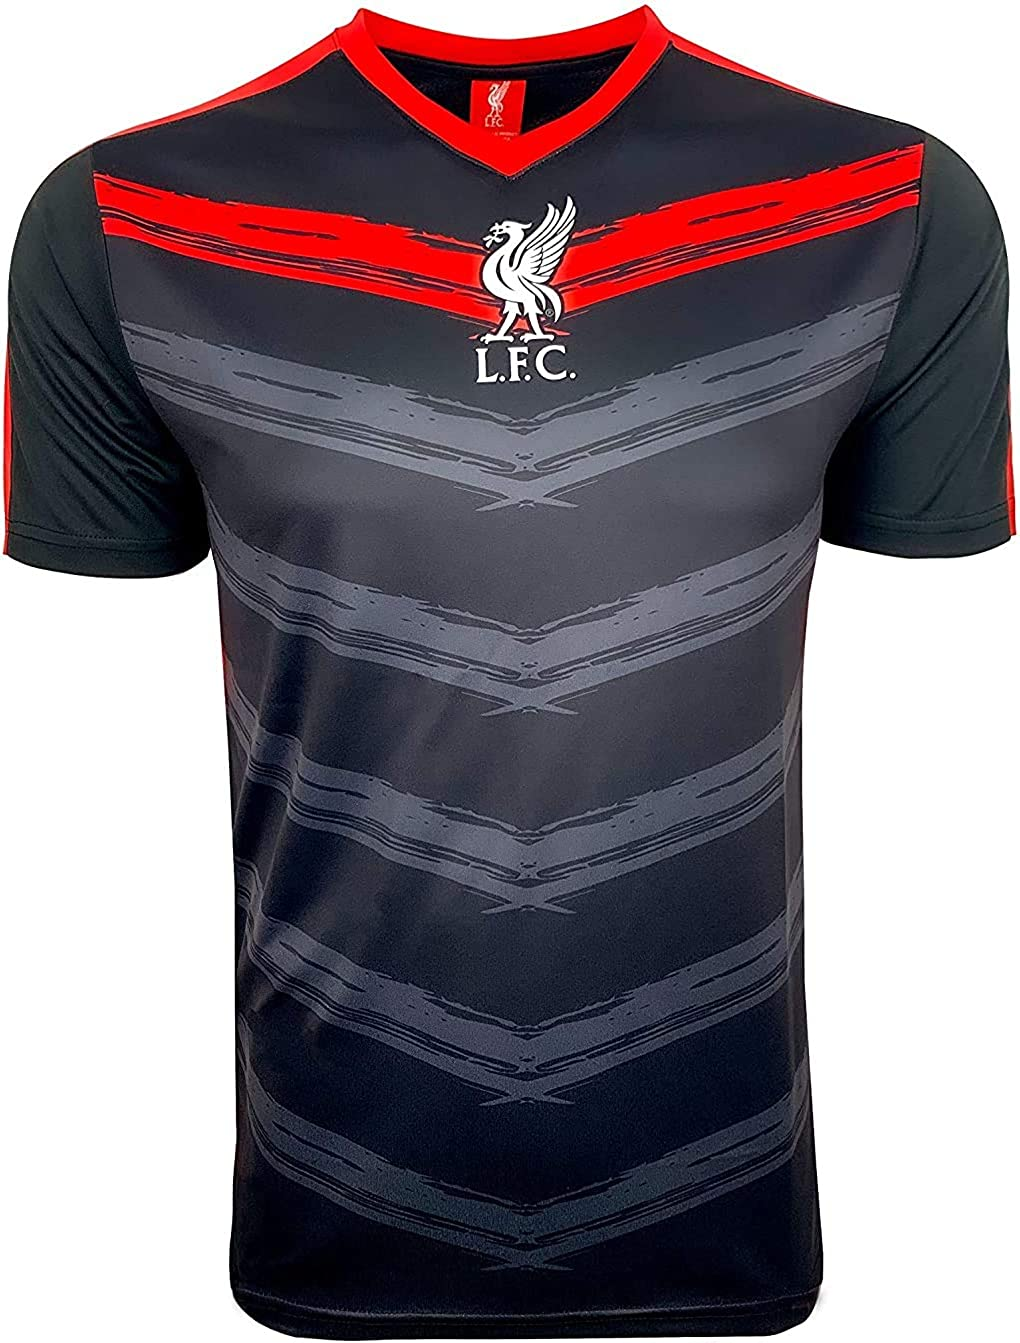 Men's Liverpool Training Licensed Finally resale start Shirt Jersey Kansas City Mall